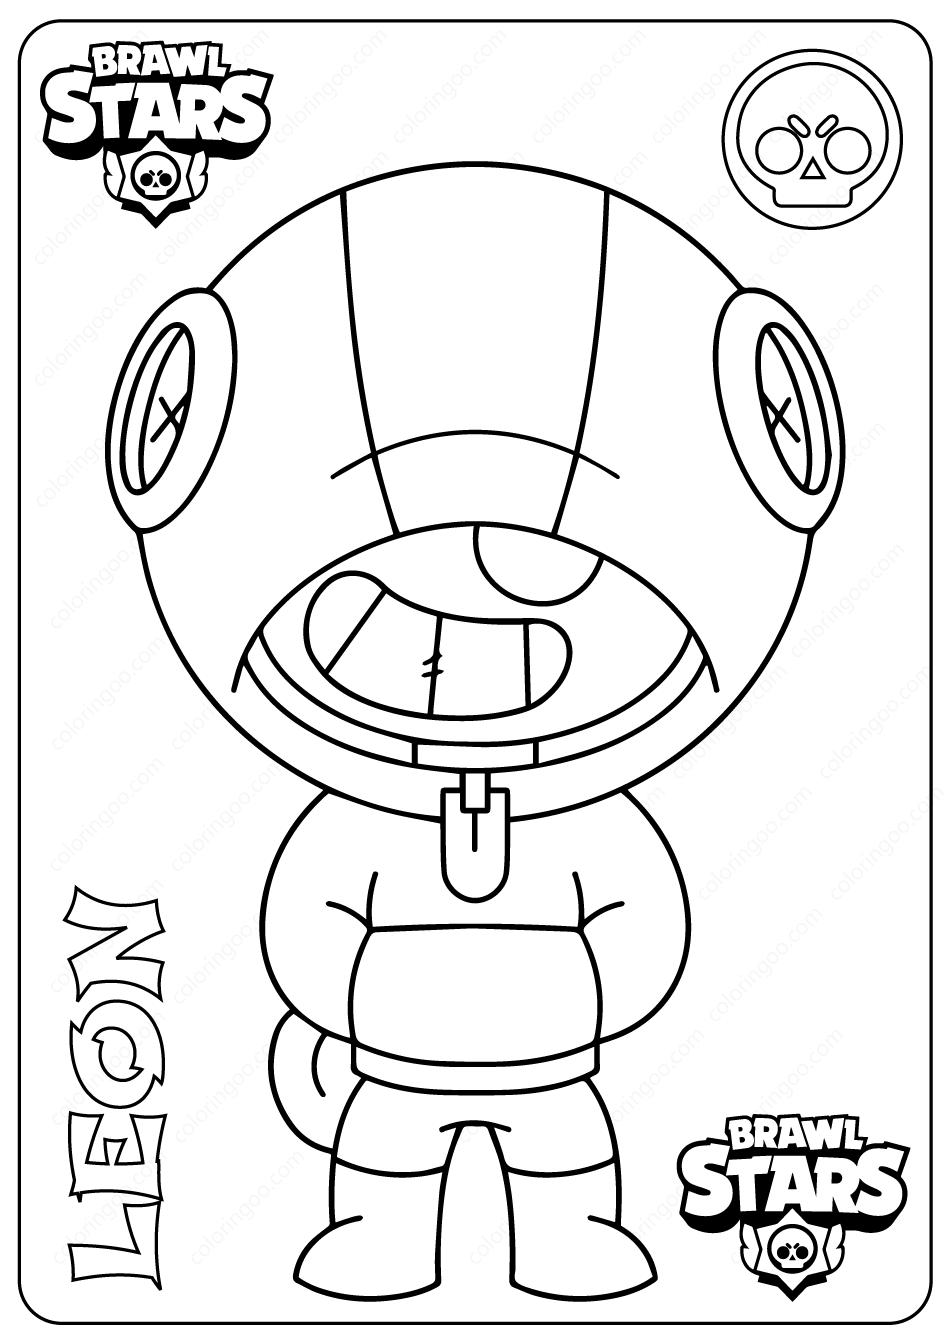 Printable Brawl Stars Leon Pdf Coloring Pages In 2020 Coloring Pages Free Printable Coloring Brawl